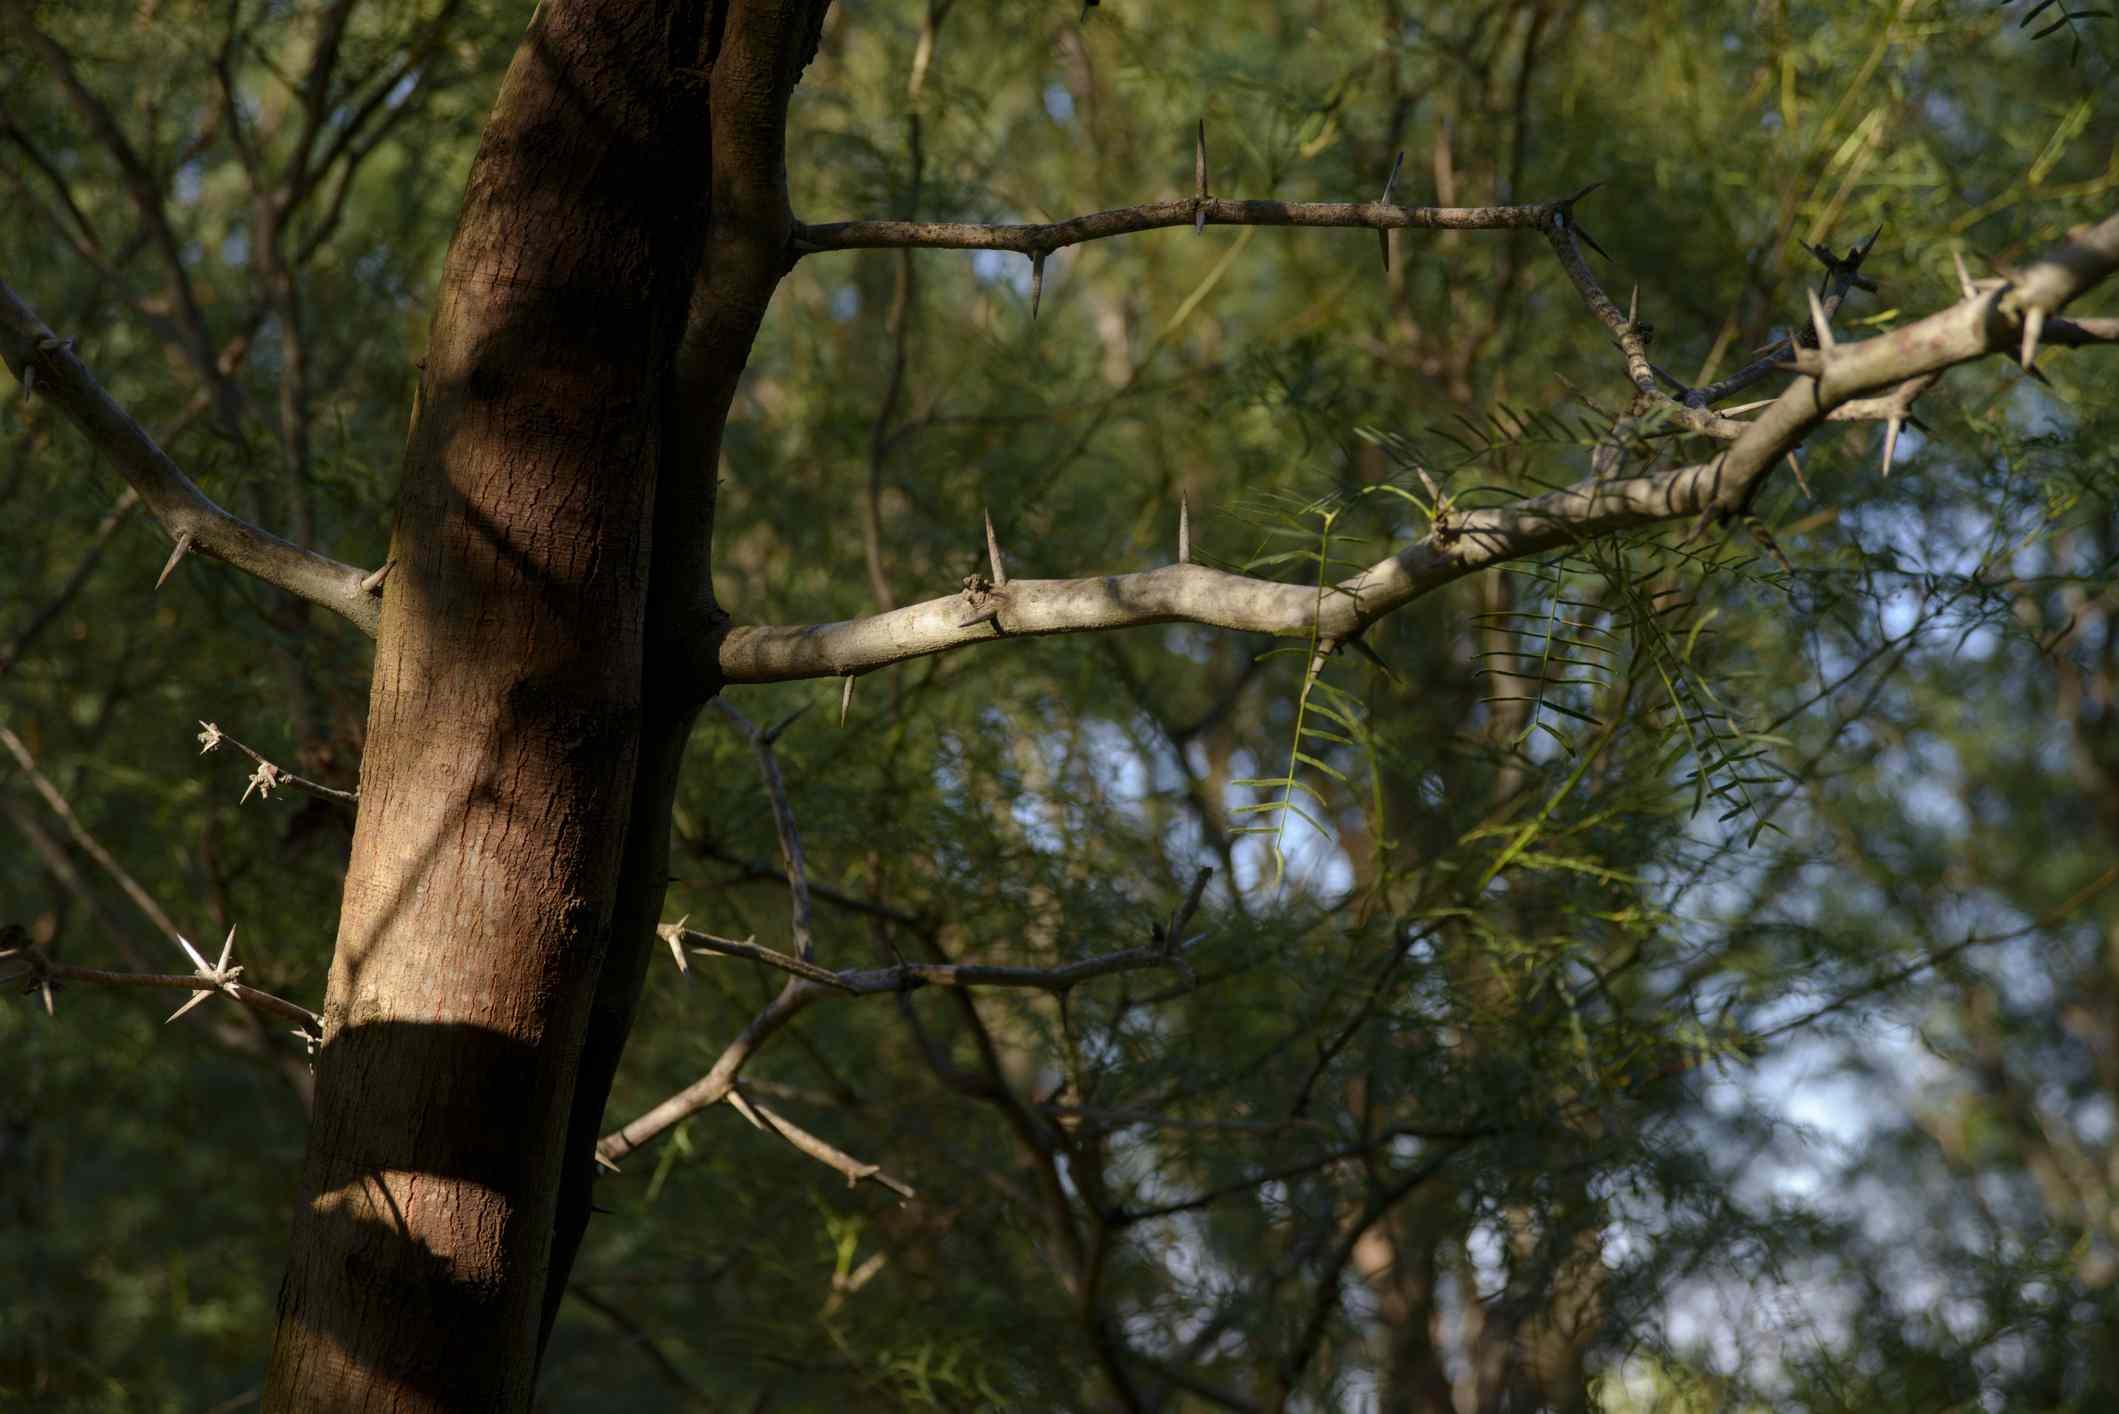 Honey Mesquite plant Prosopis chilensis